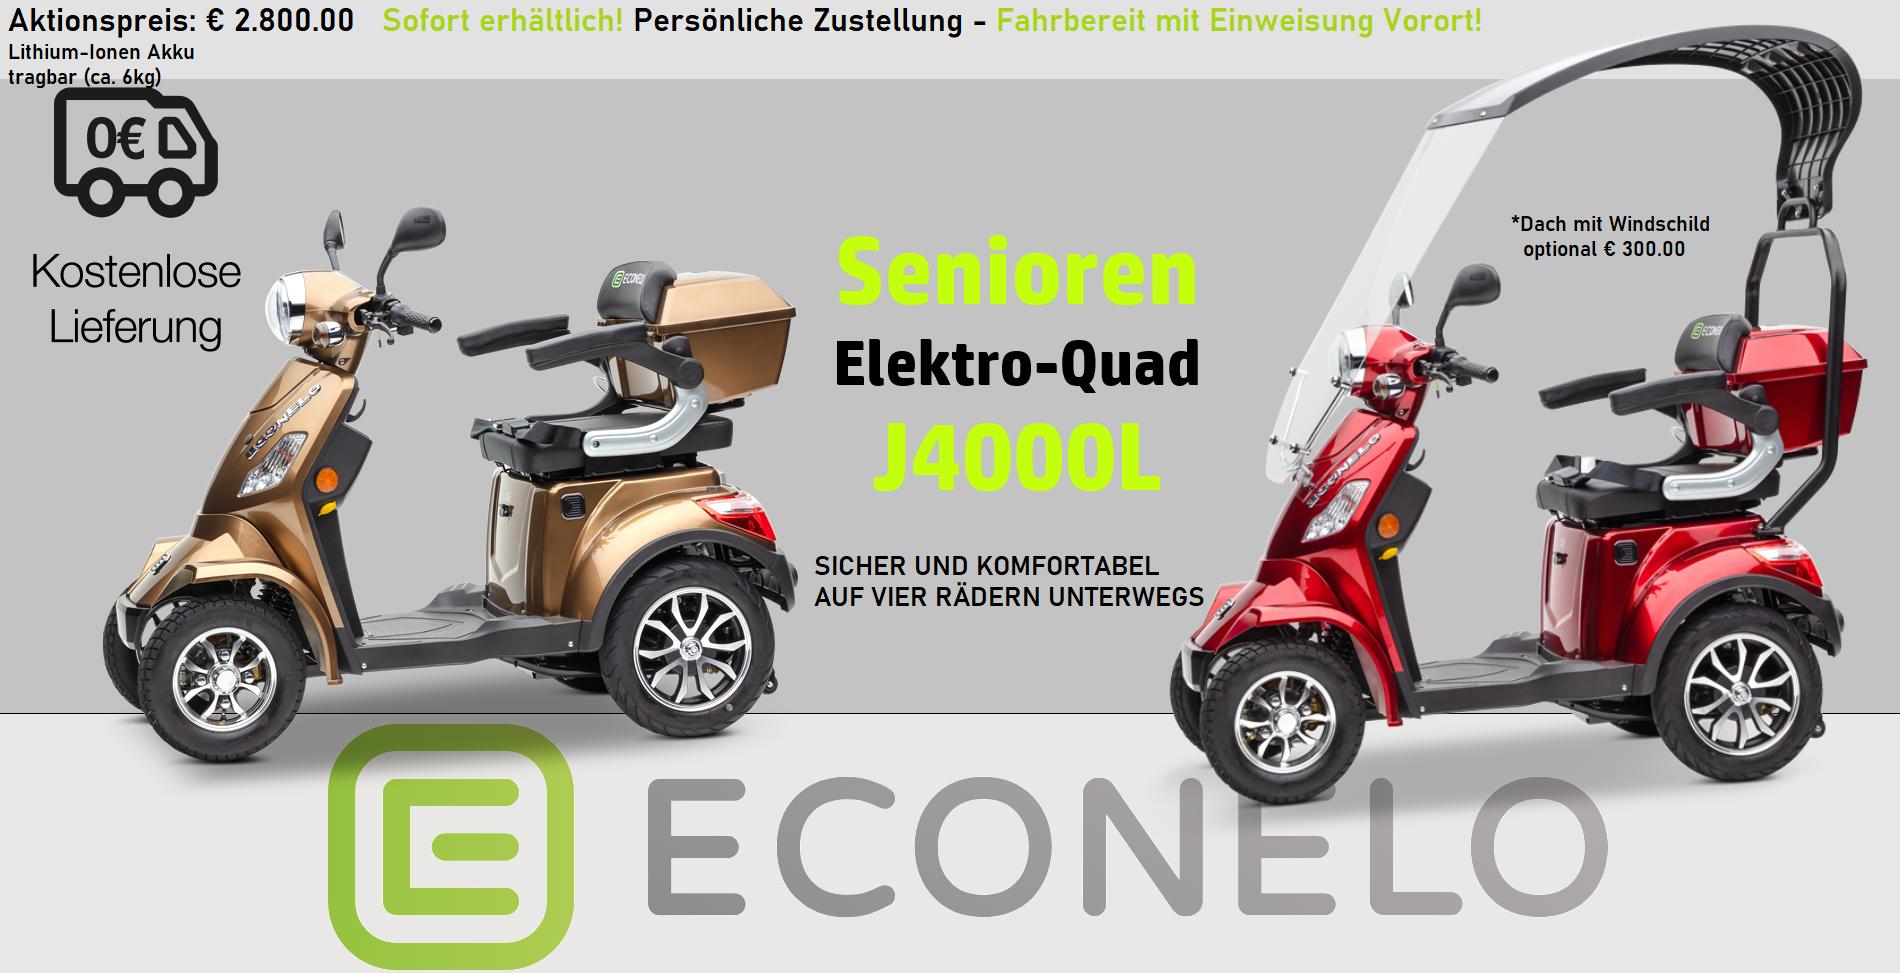 Econelo Seniorenmobile Vierrad mit Lithium-Ionen Akku